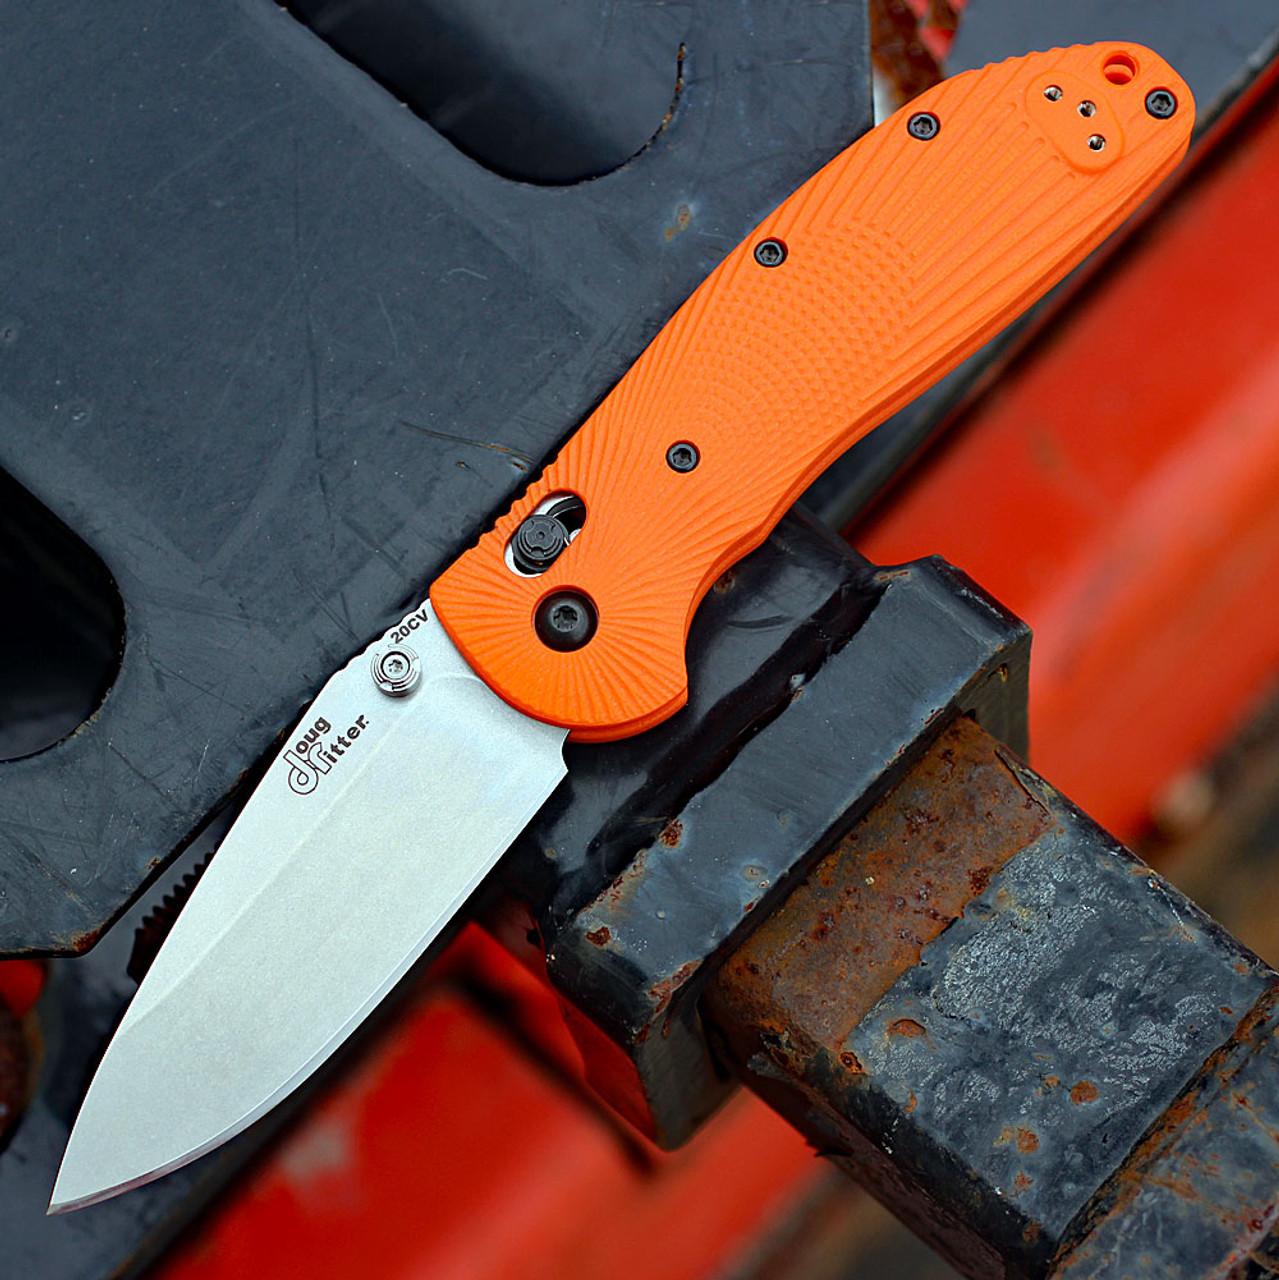 Doug Ritter RSK®  MK1-G2 Knifeworks Exclusive-Orange G-10